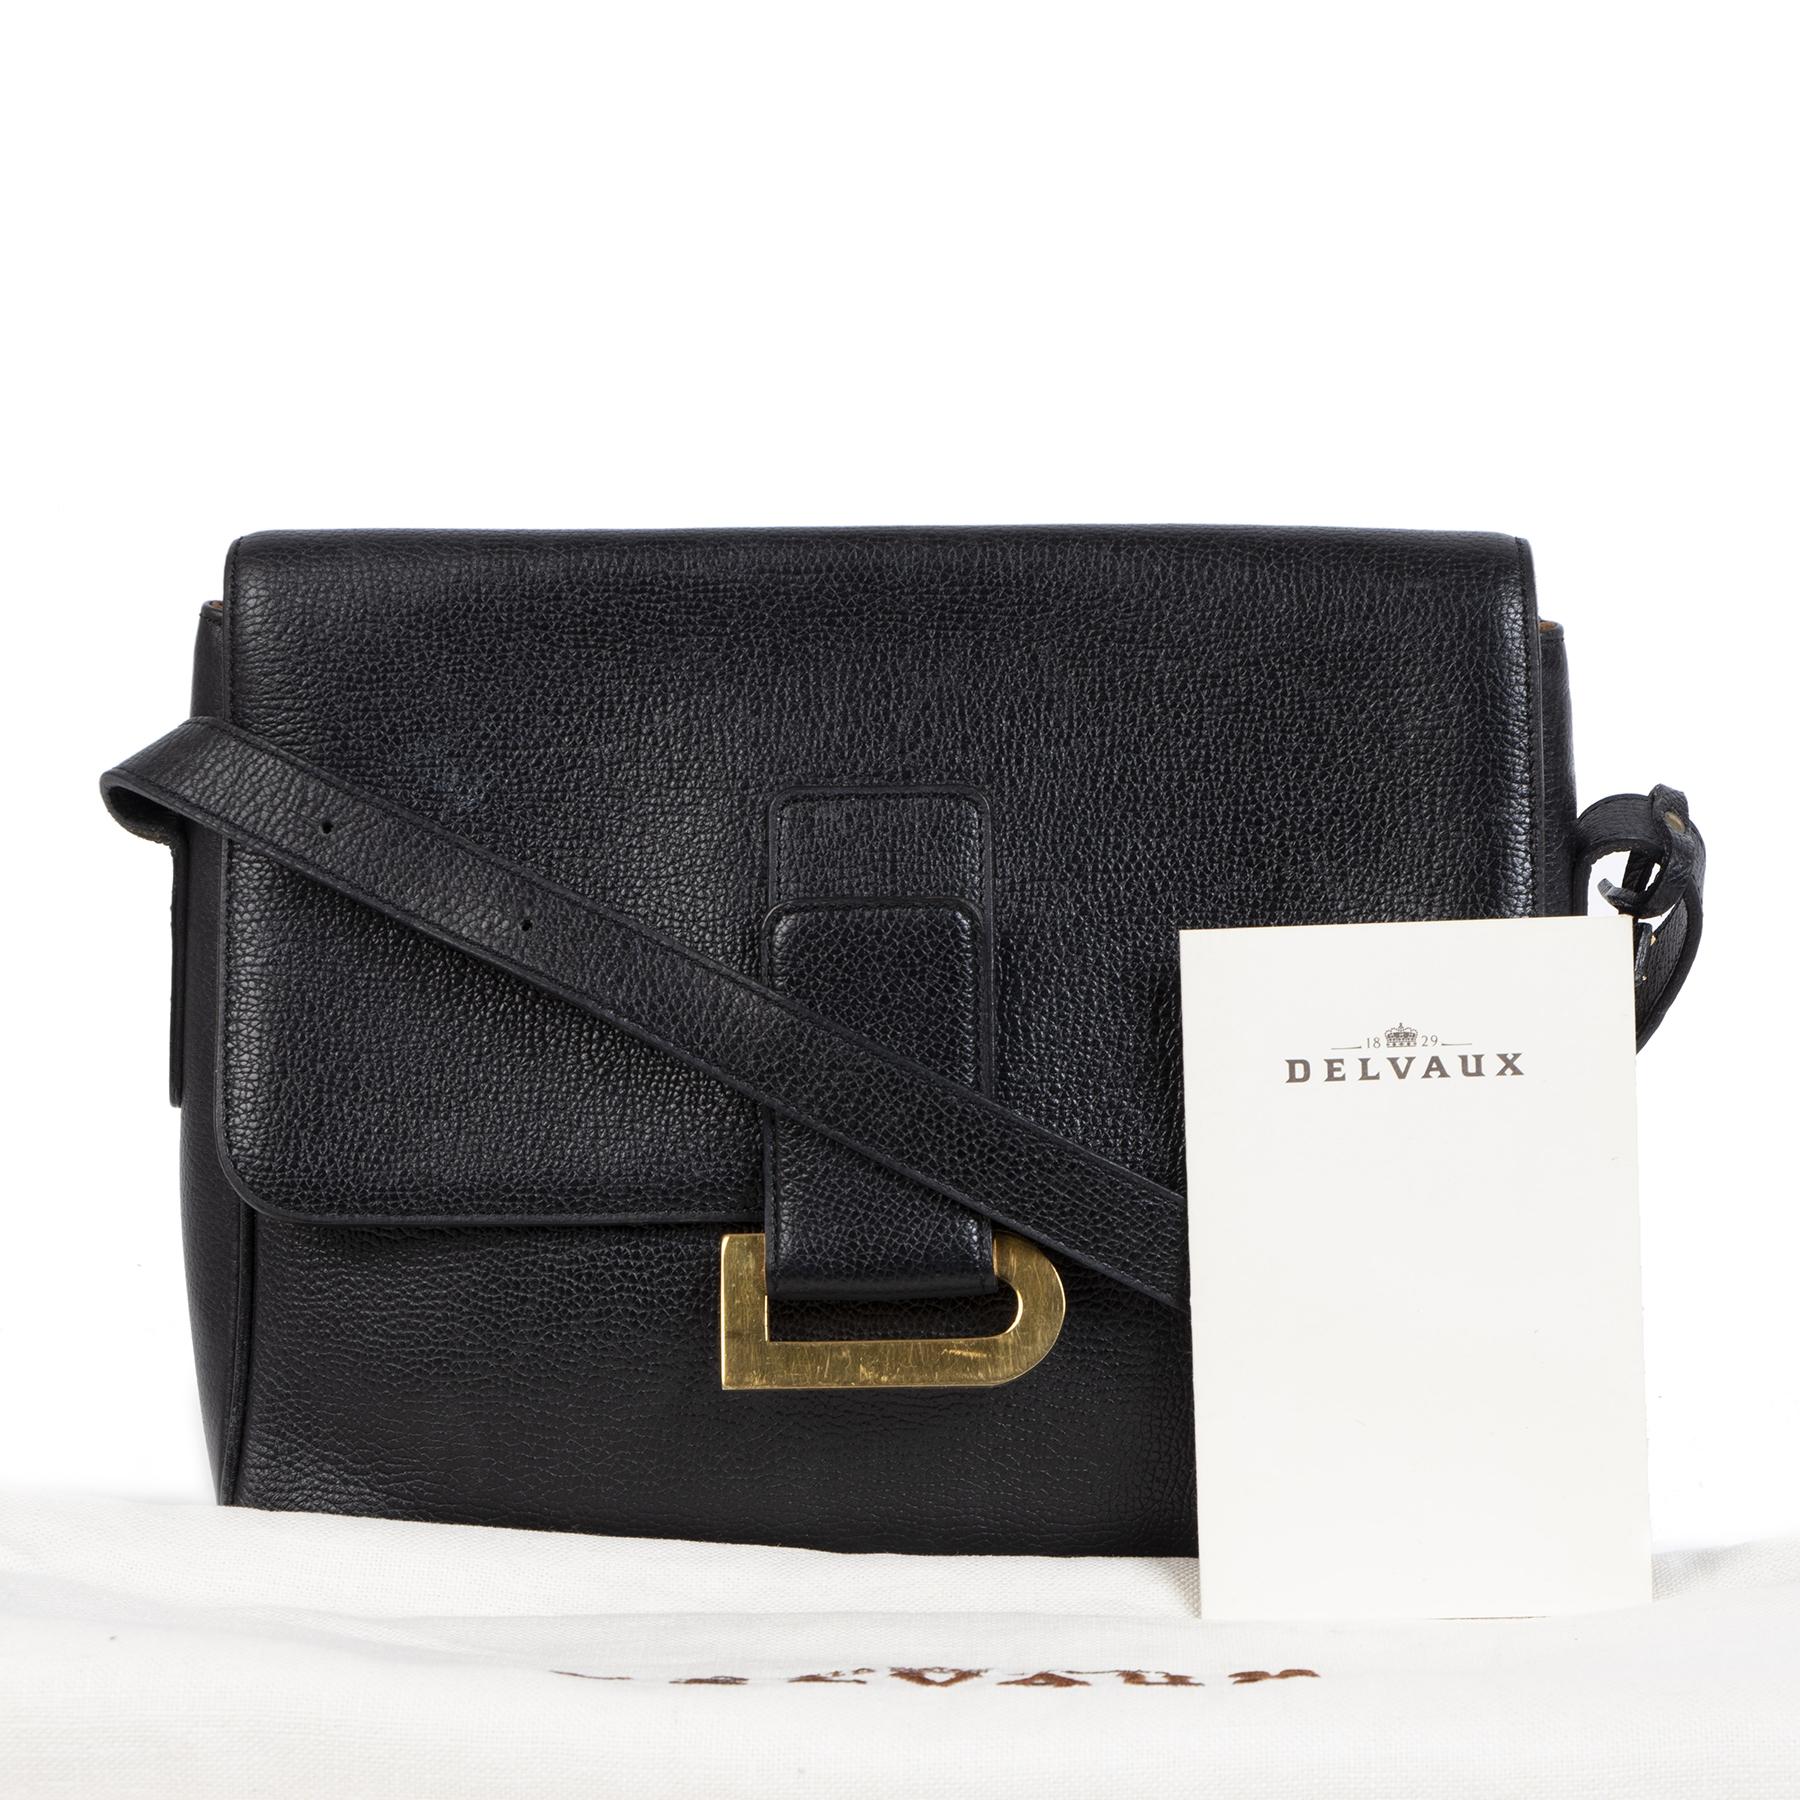 Delvaux Black Poirier Crossbody Bag